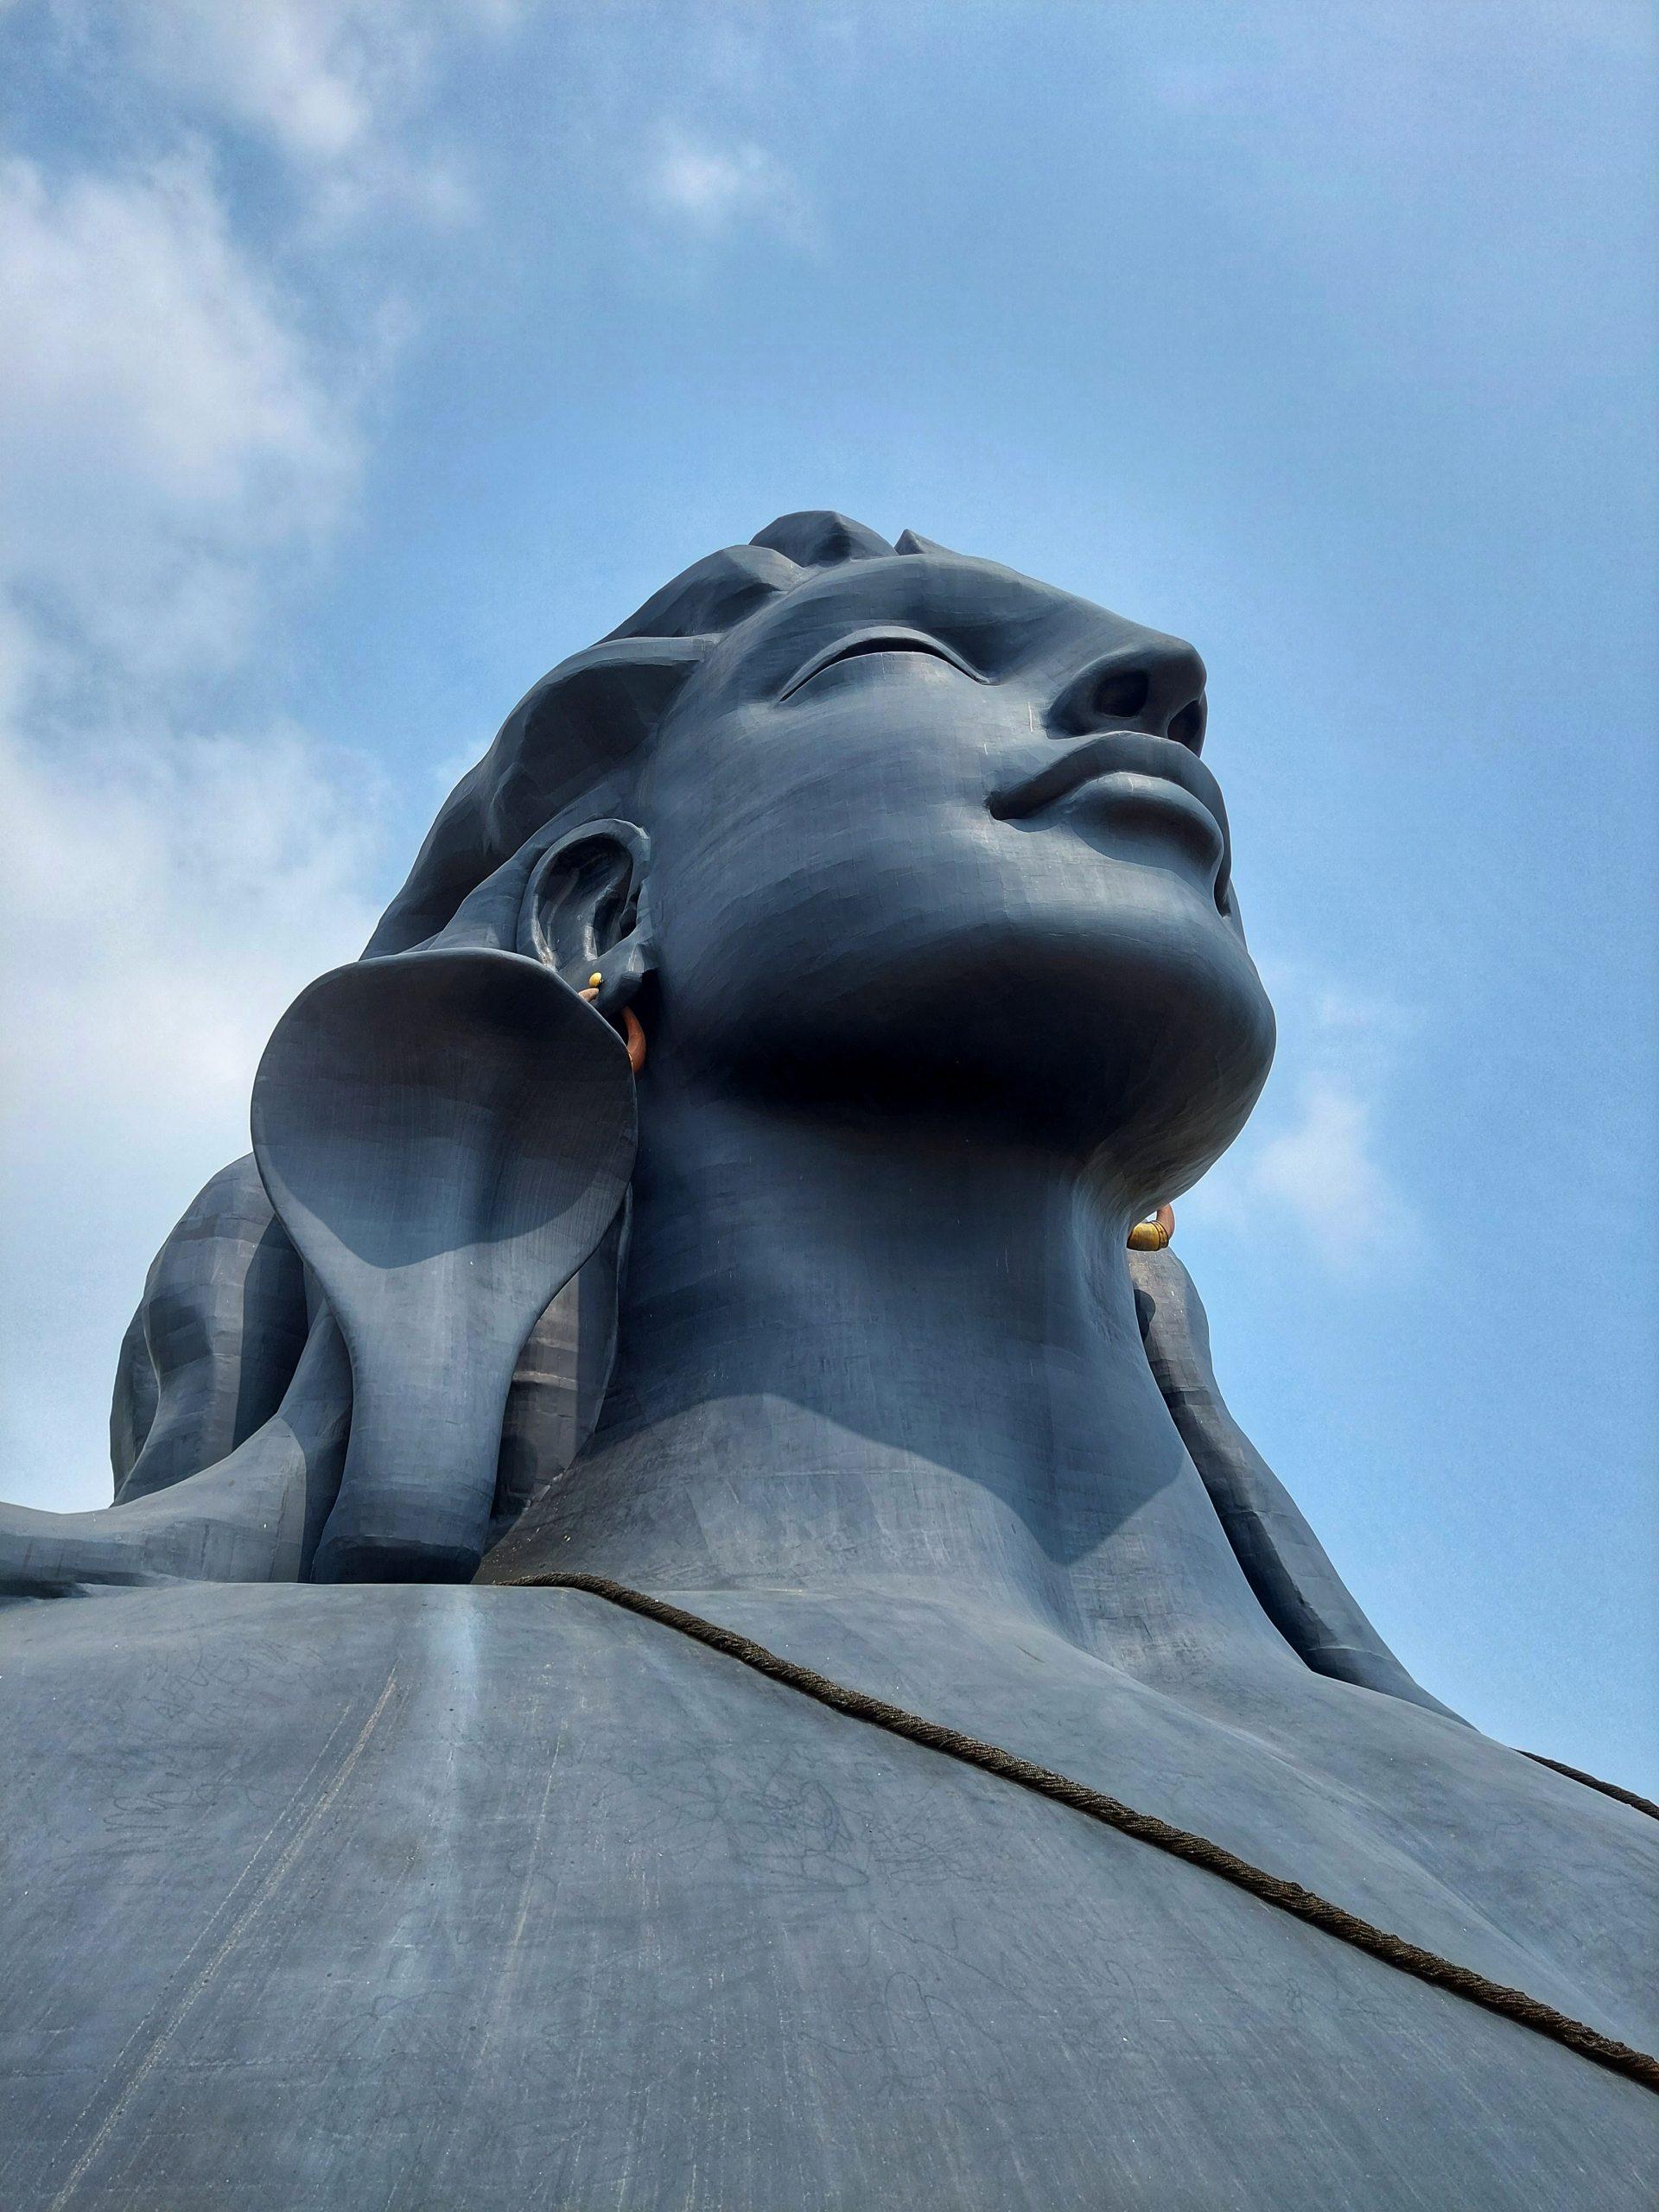 Lord Shiva statue Coimbatore, Tamil Nadu